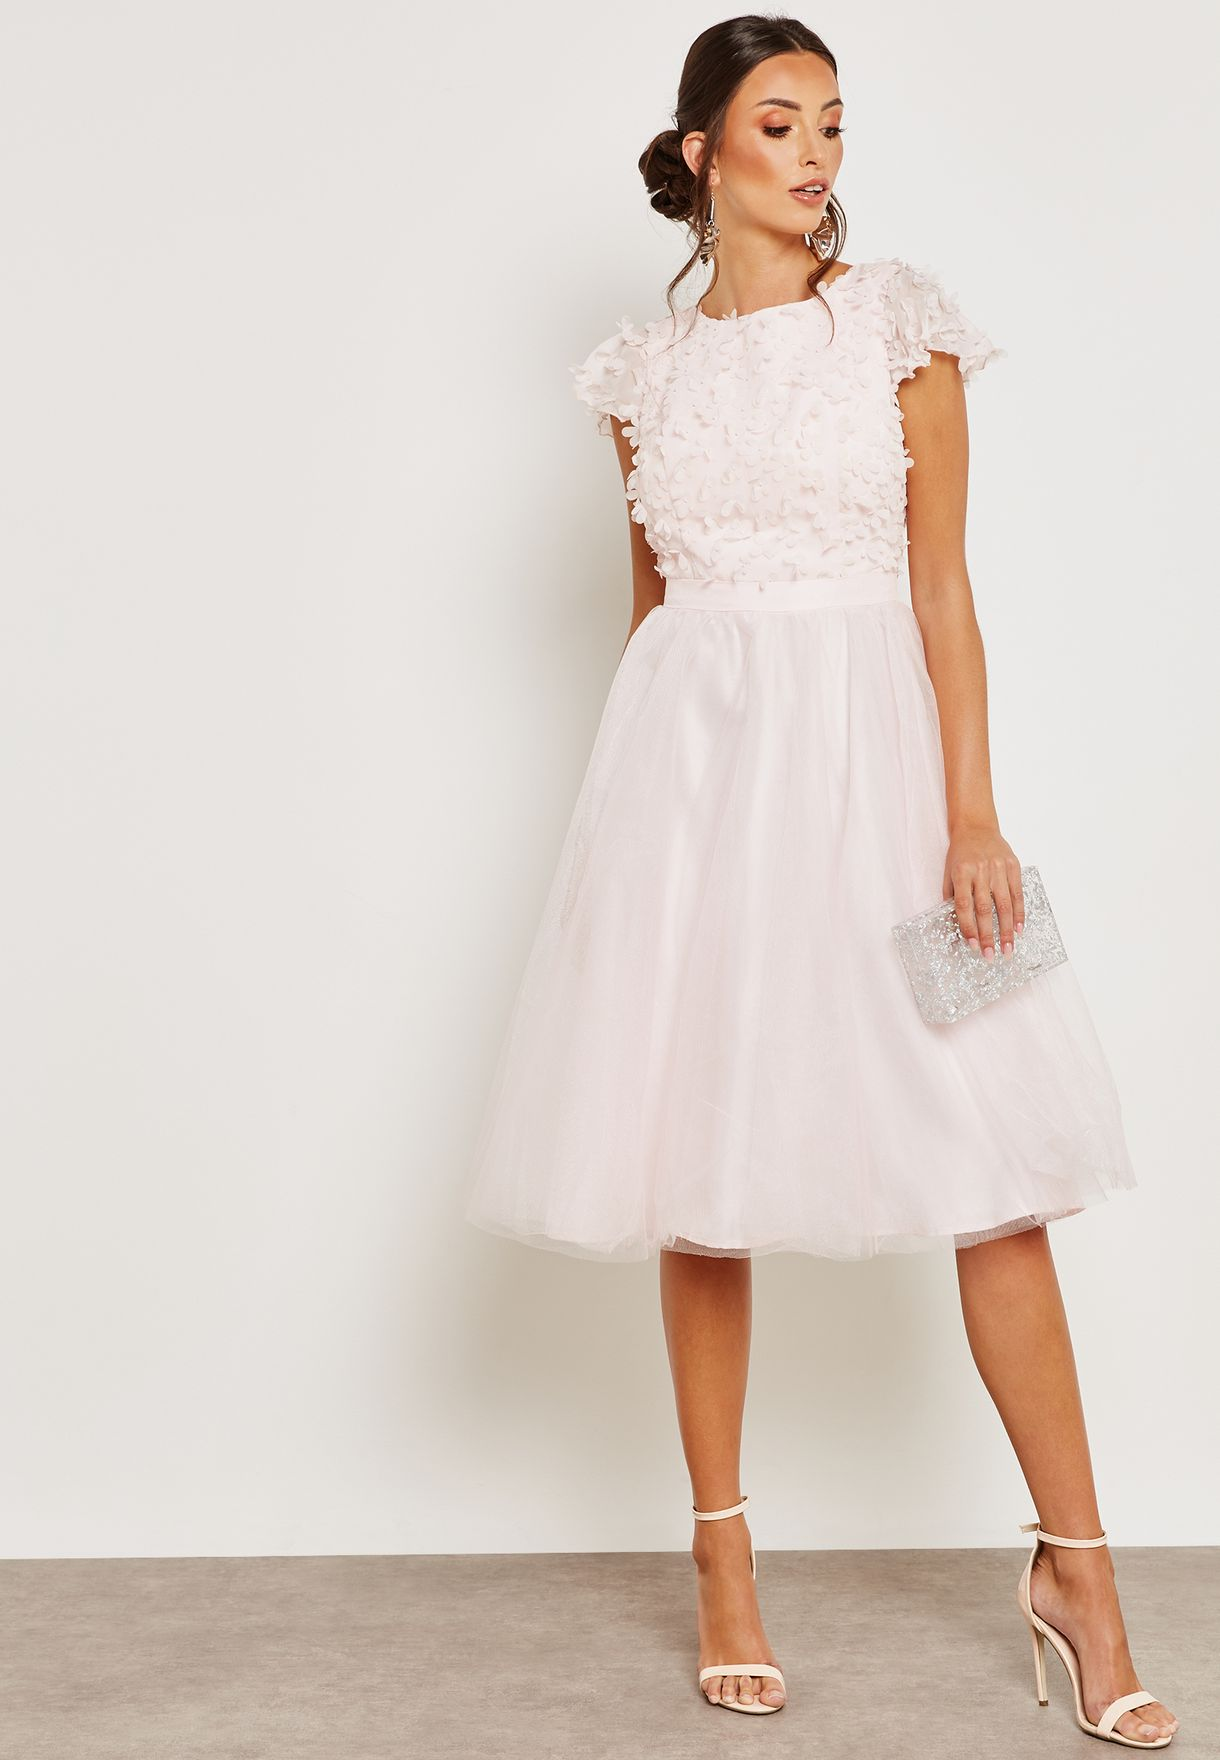 Floral Detail Tulle Dress